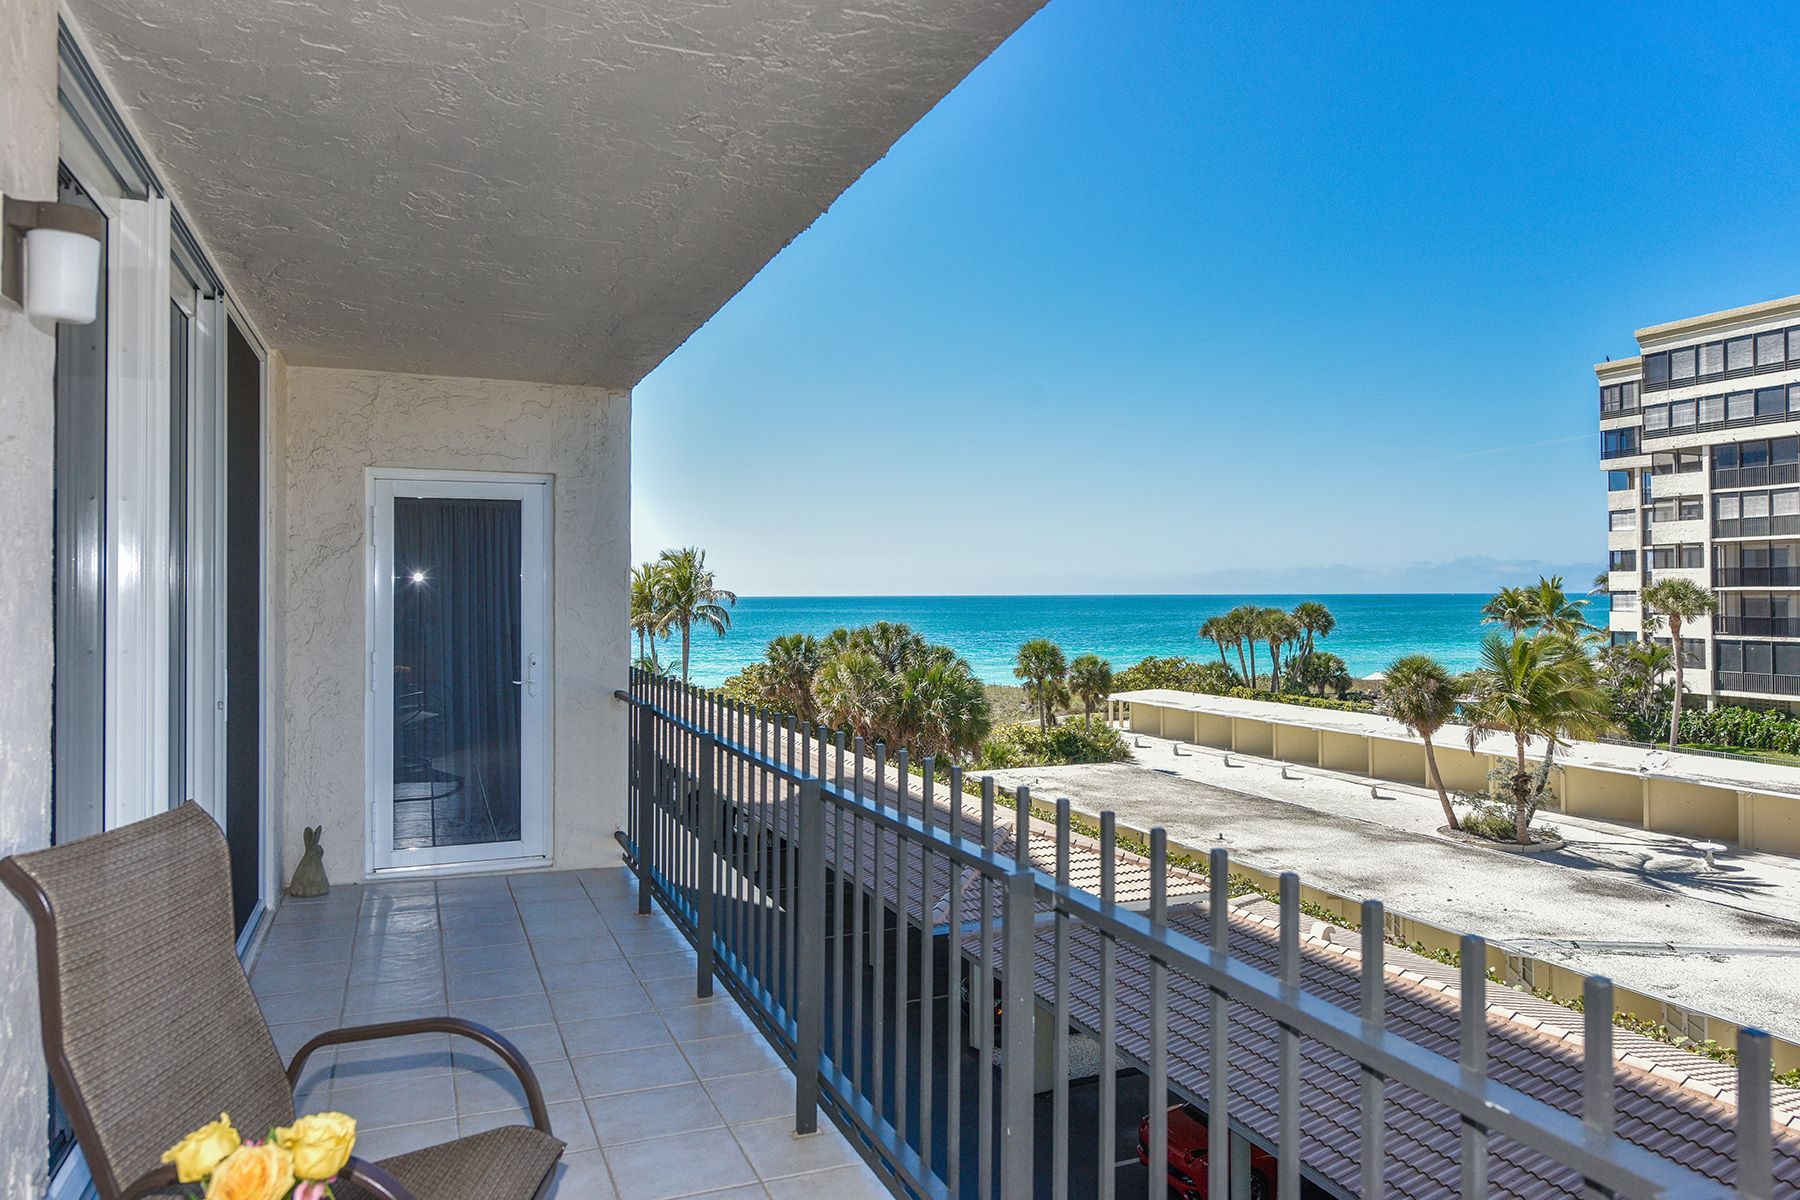 Condominium for Sale at LIDO BEACH 1212 Benjamin Franklin Dr 308, Sarasota, Florida 34236 United States